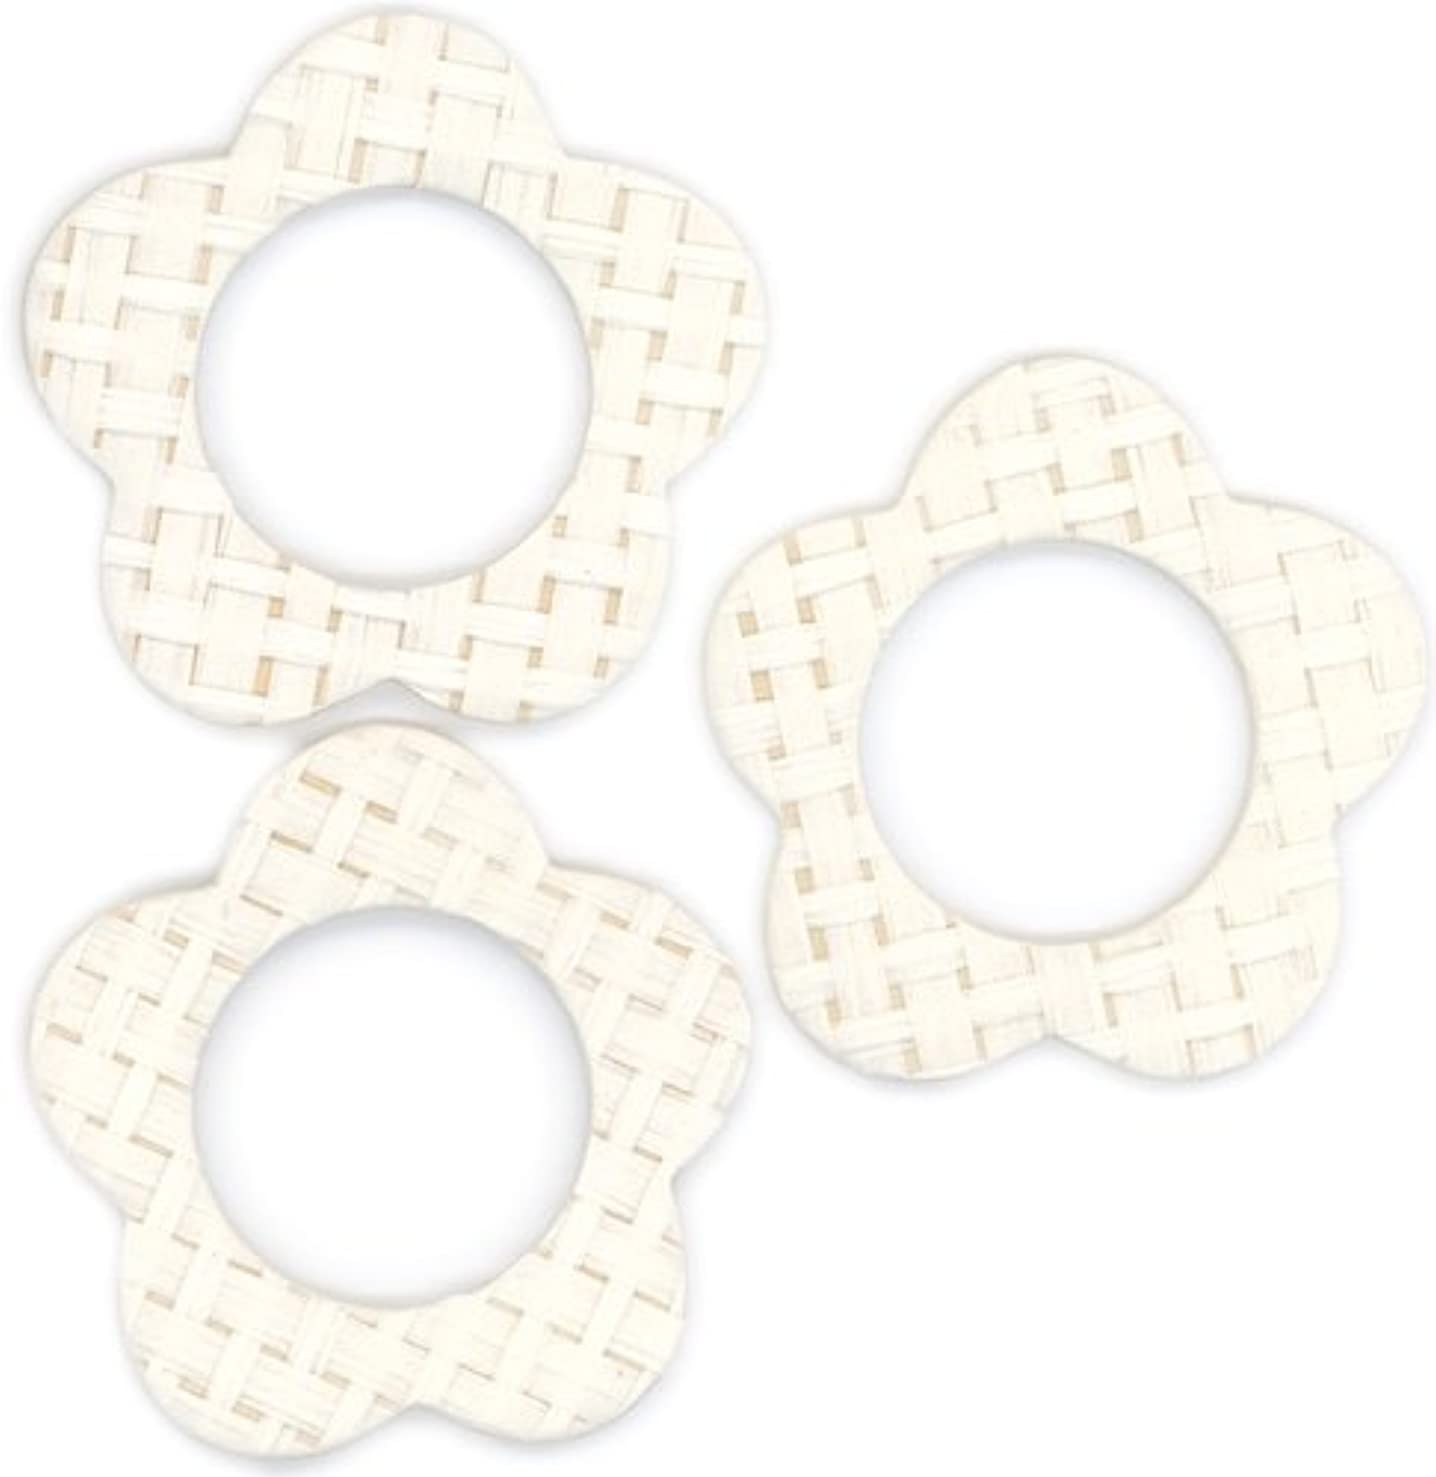 FabScraps Cardstock Mini Frames Cream/Daisy, 3 Per Package